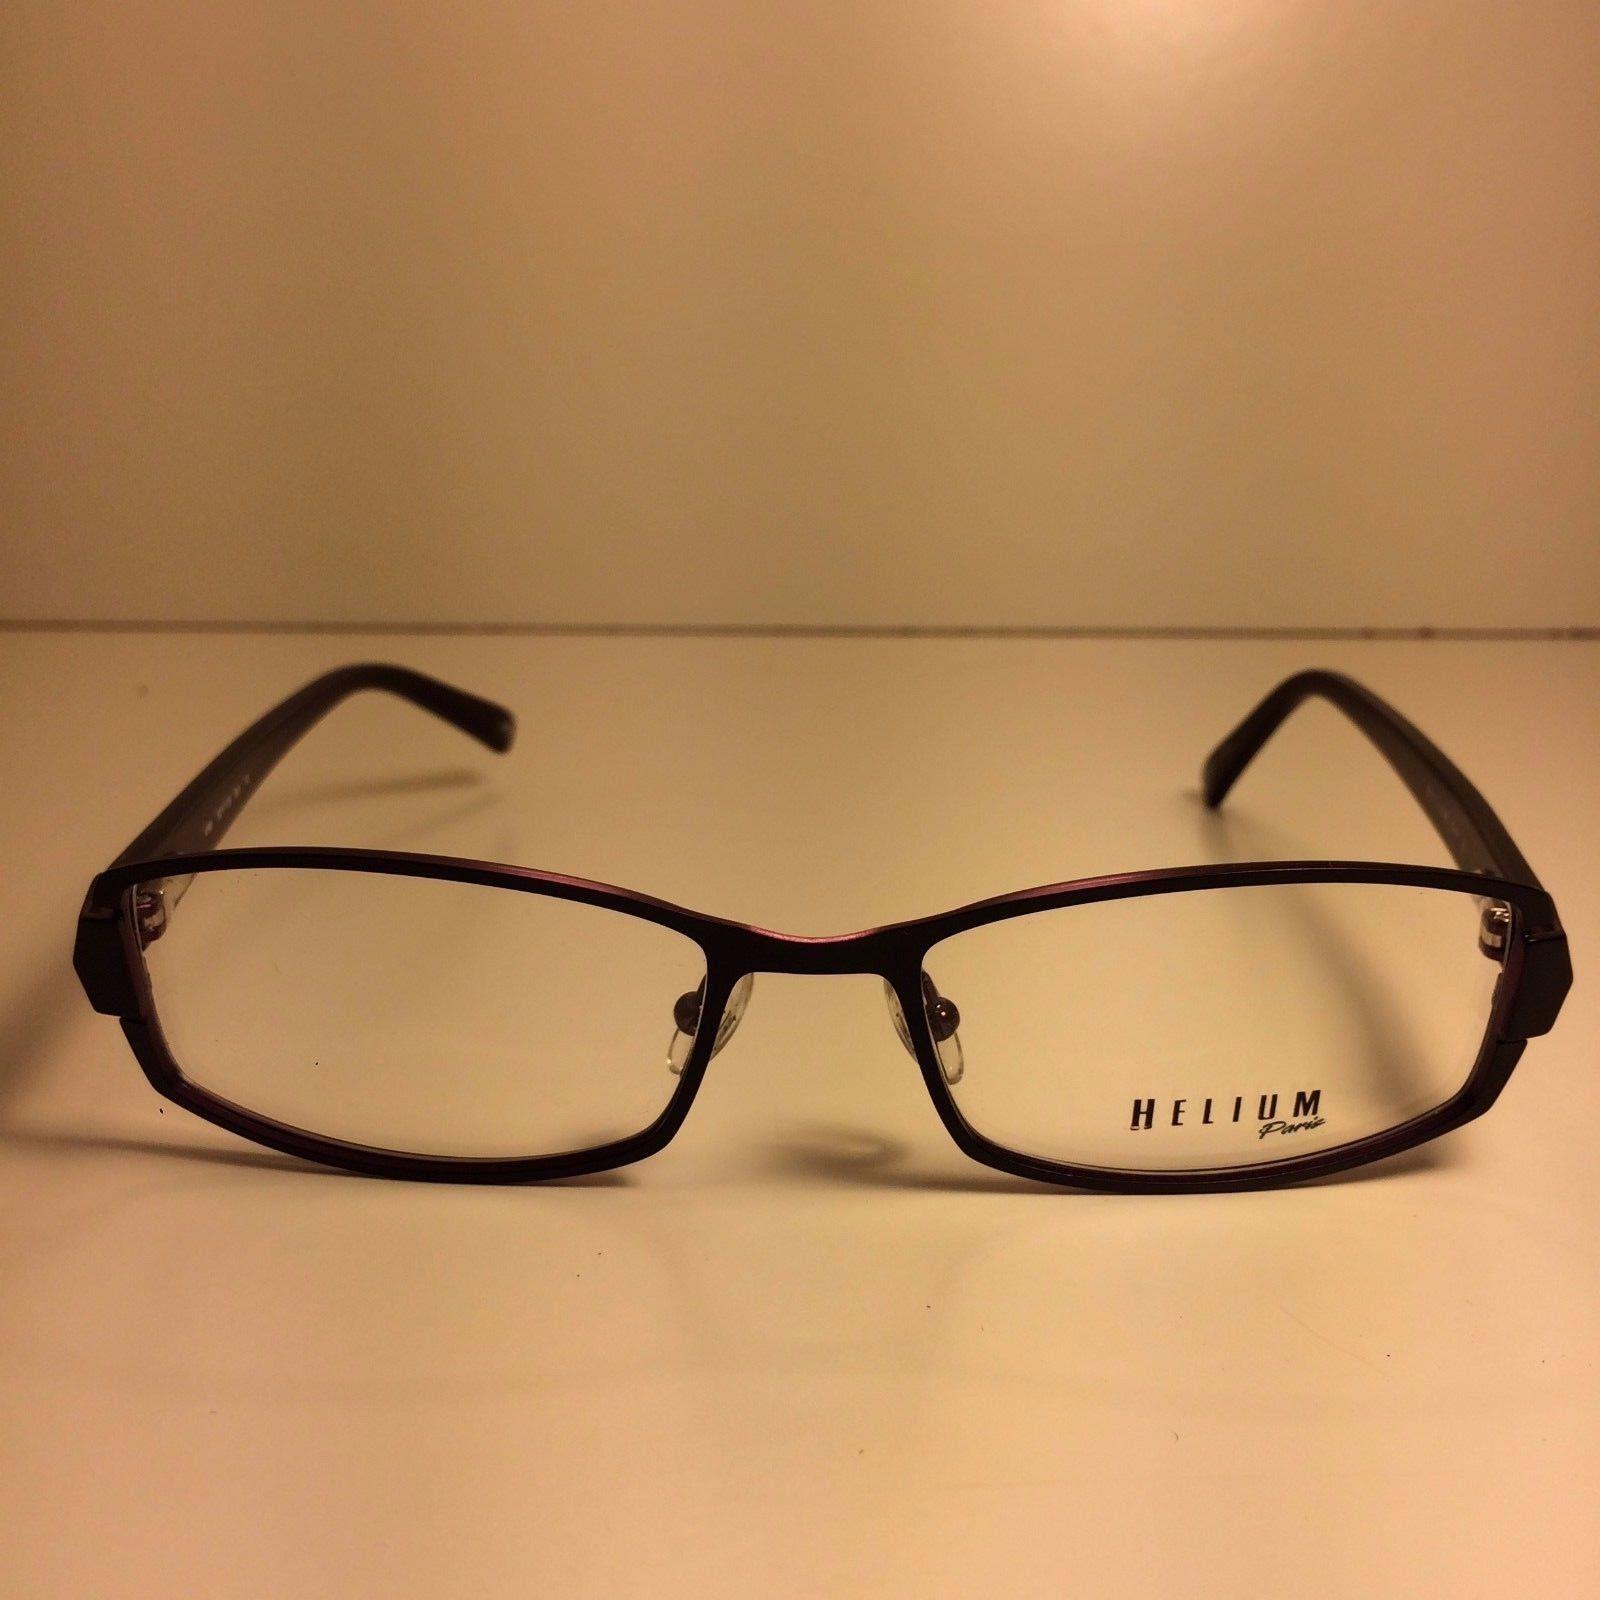 Helium Paris 4190 Eyeglass Frames Size 52/17-135 Womens ...